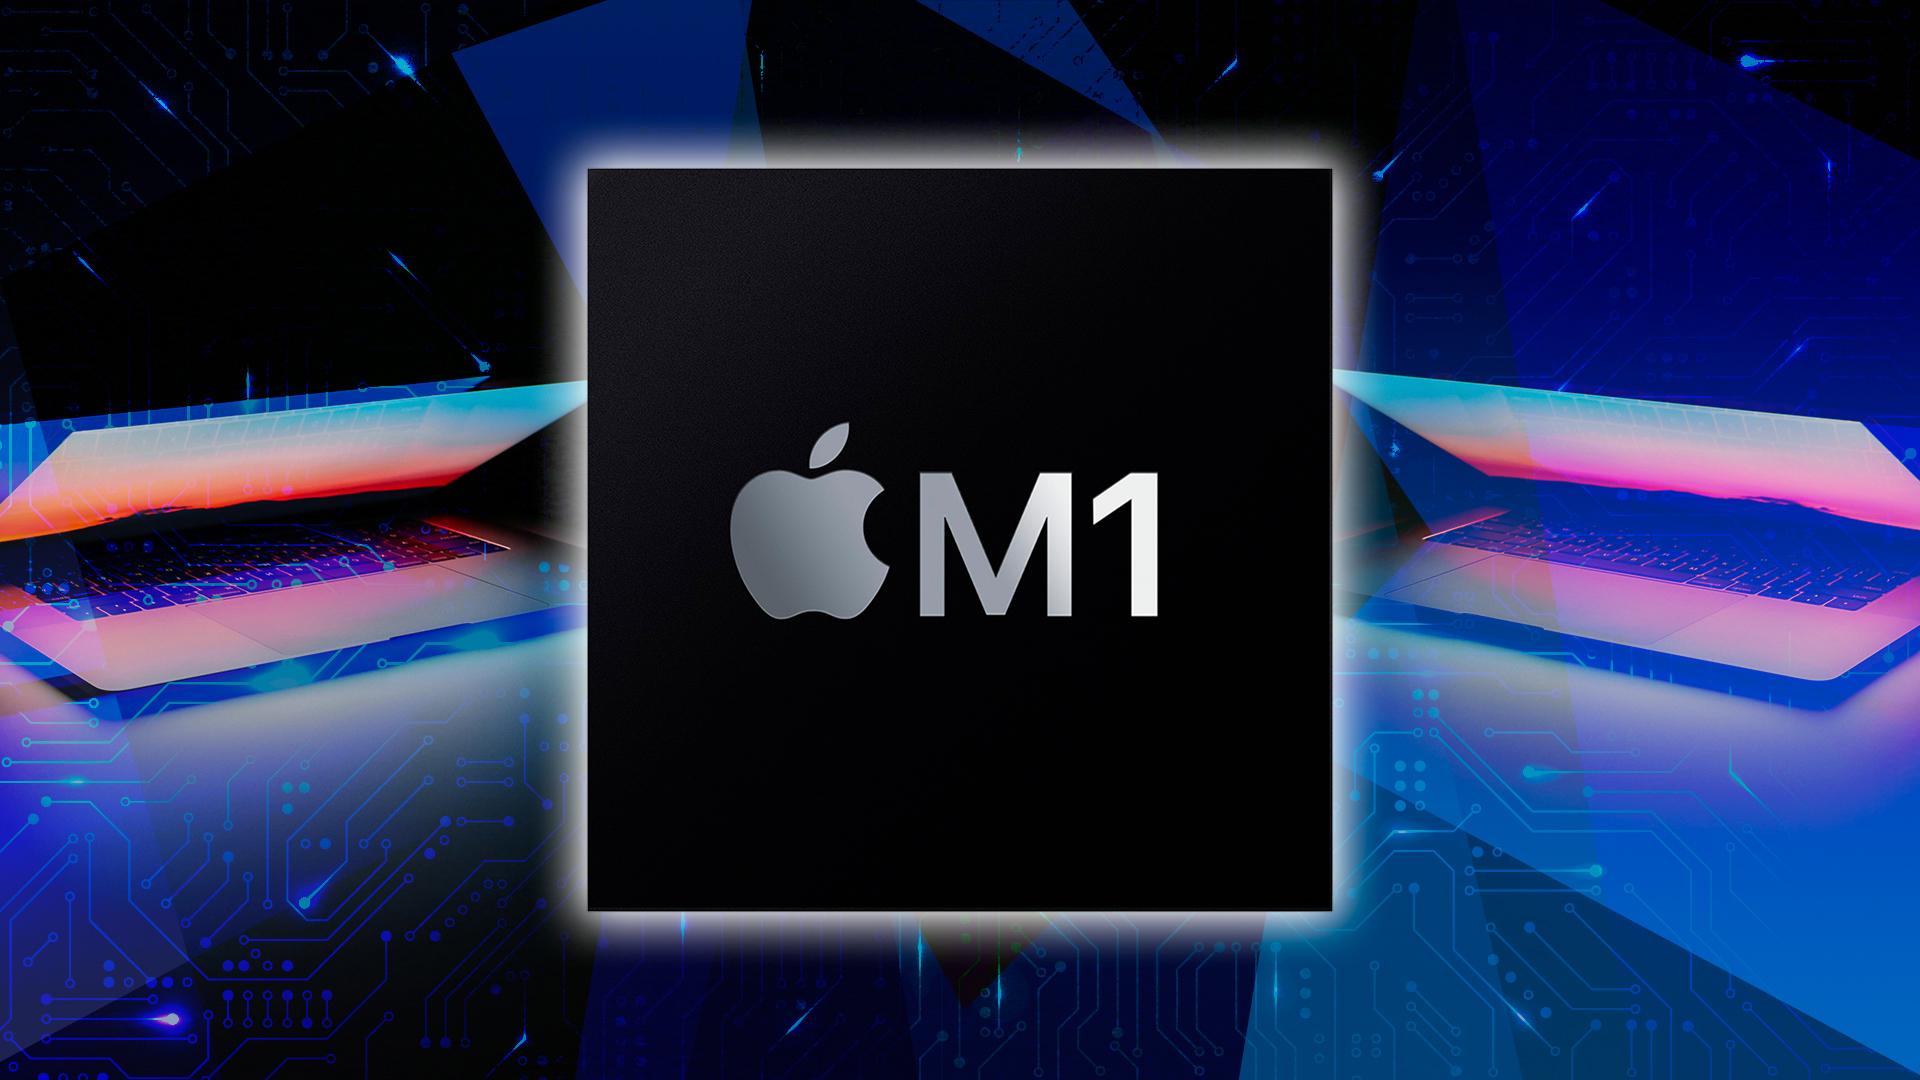 Apple, Logo, Prozessor, Cpu, Chip, SoC, Arm, Prozessoren, Macbook, Apple M1, M1, Apple Logo, M1 Chip, Apple Chip, Apple M1 Chip, M1 Arm, Apple ARM, Arm Chip, Apple Arm Chip, Apple Notebook, Apple Laptop